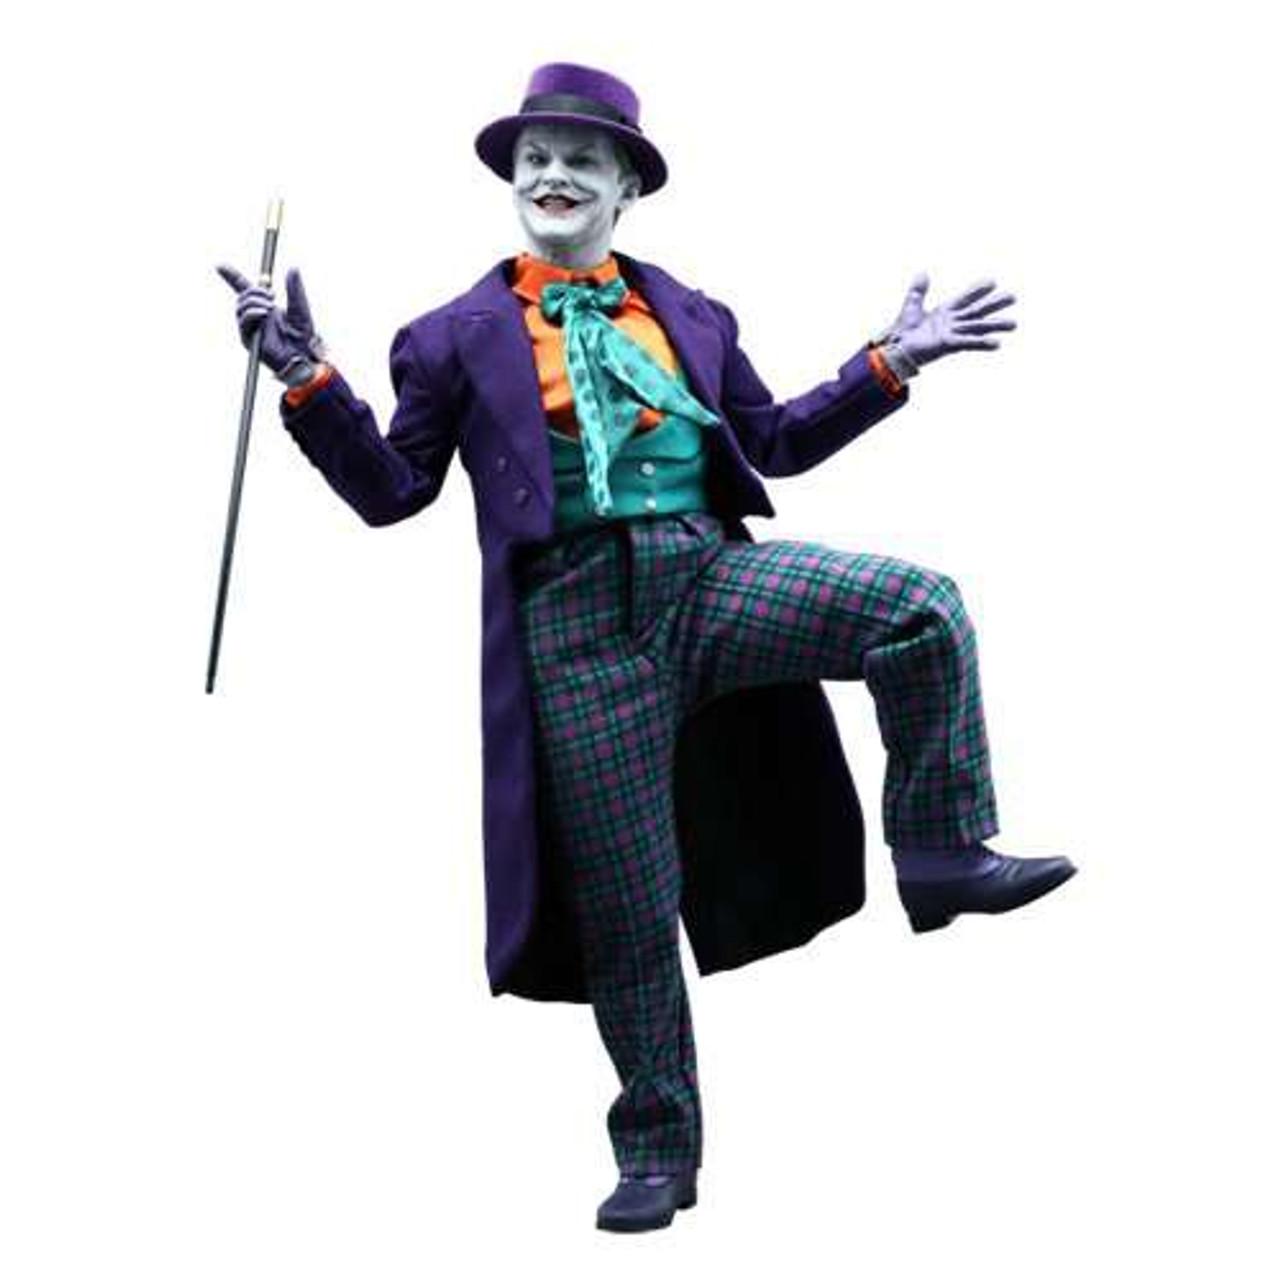 Batman 1989 Movie Movie Masterpiece Deluxe The Joker 1/6 Collectible Figure DX-08 [Jack Nicholson]